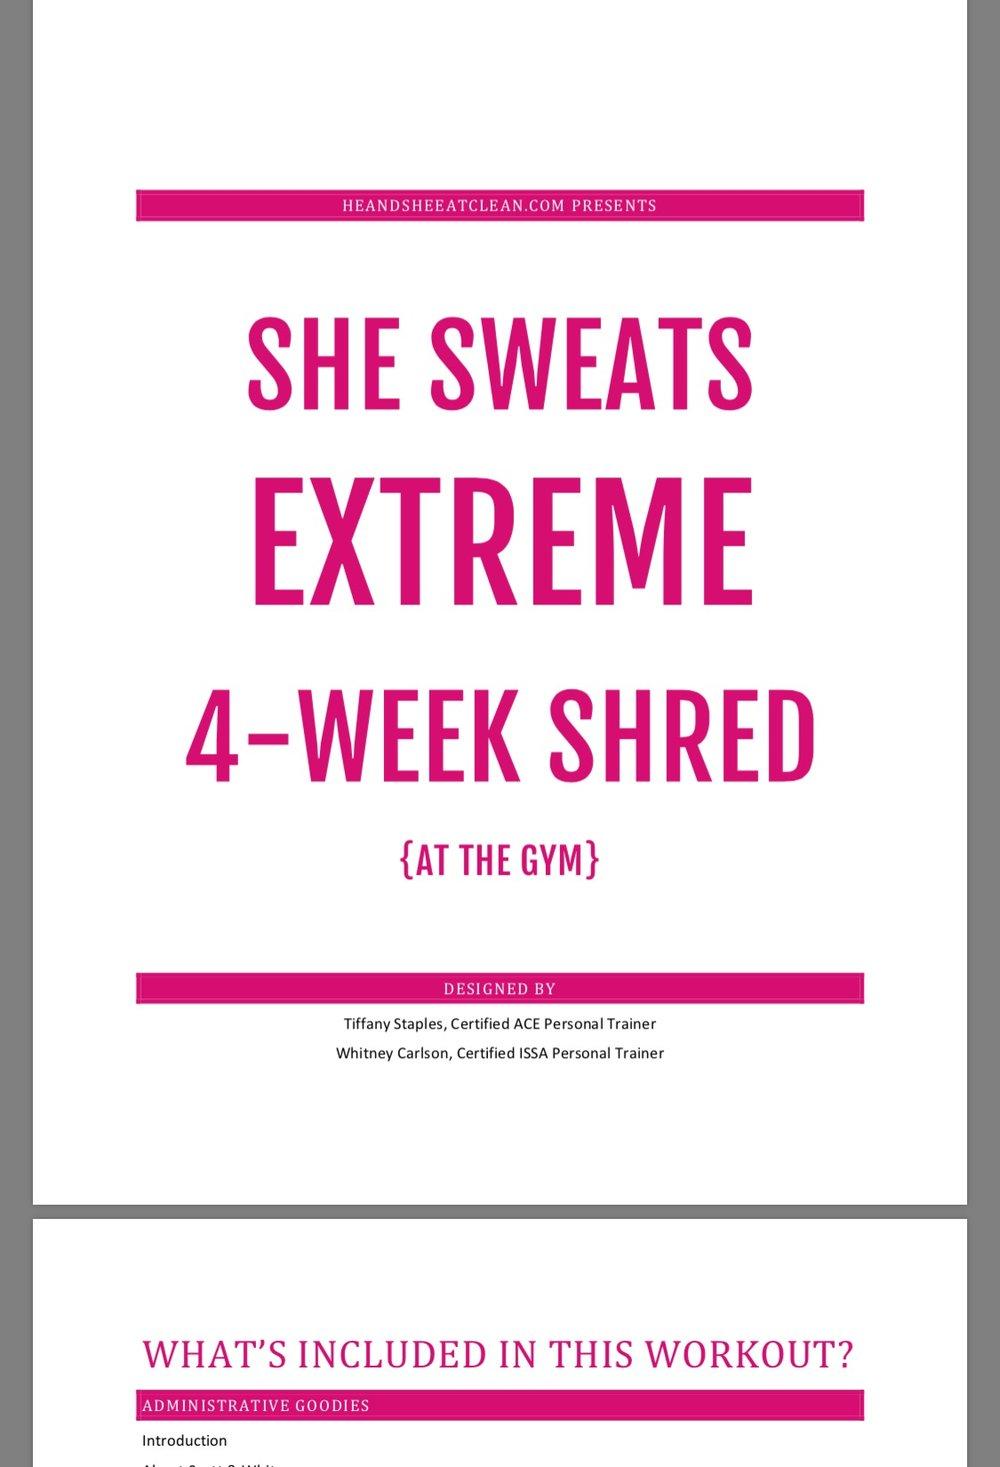 She Sweats Extreme 4-Week Shred   He and She Eat Clean